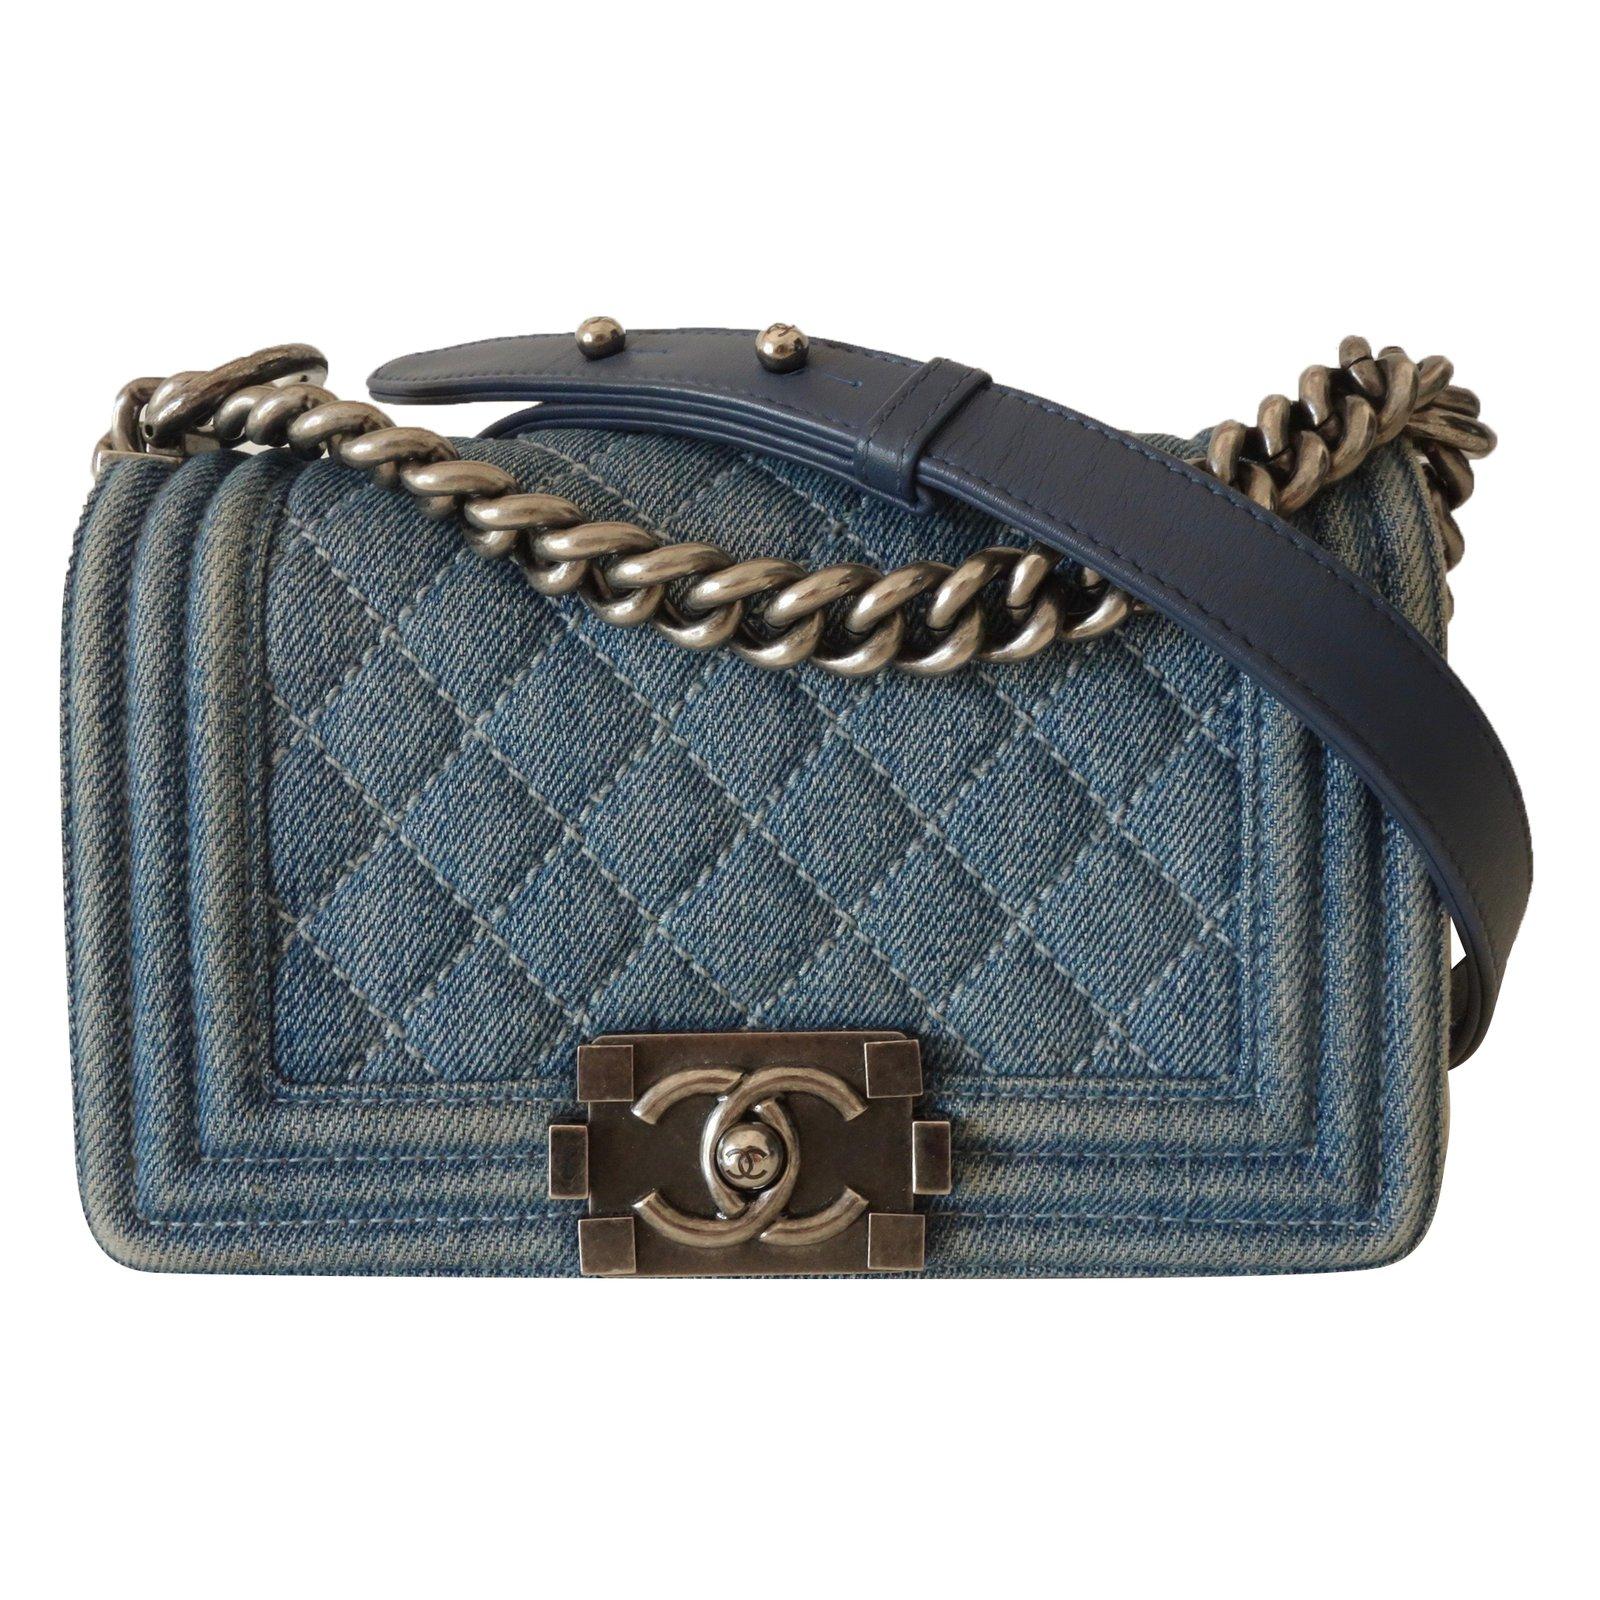 sacs main chanel sac chanel boy jean pm jean bleu joli closet. Black Bedroom Furniture Sets. Home Design Ideas